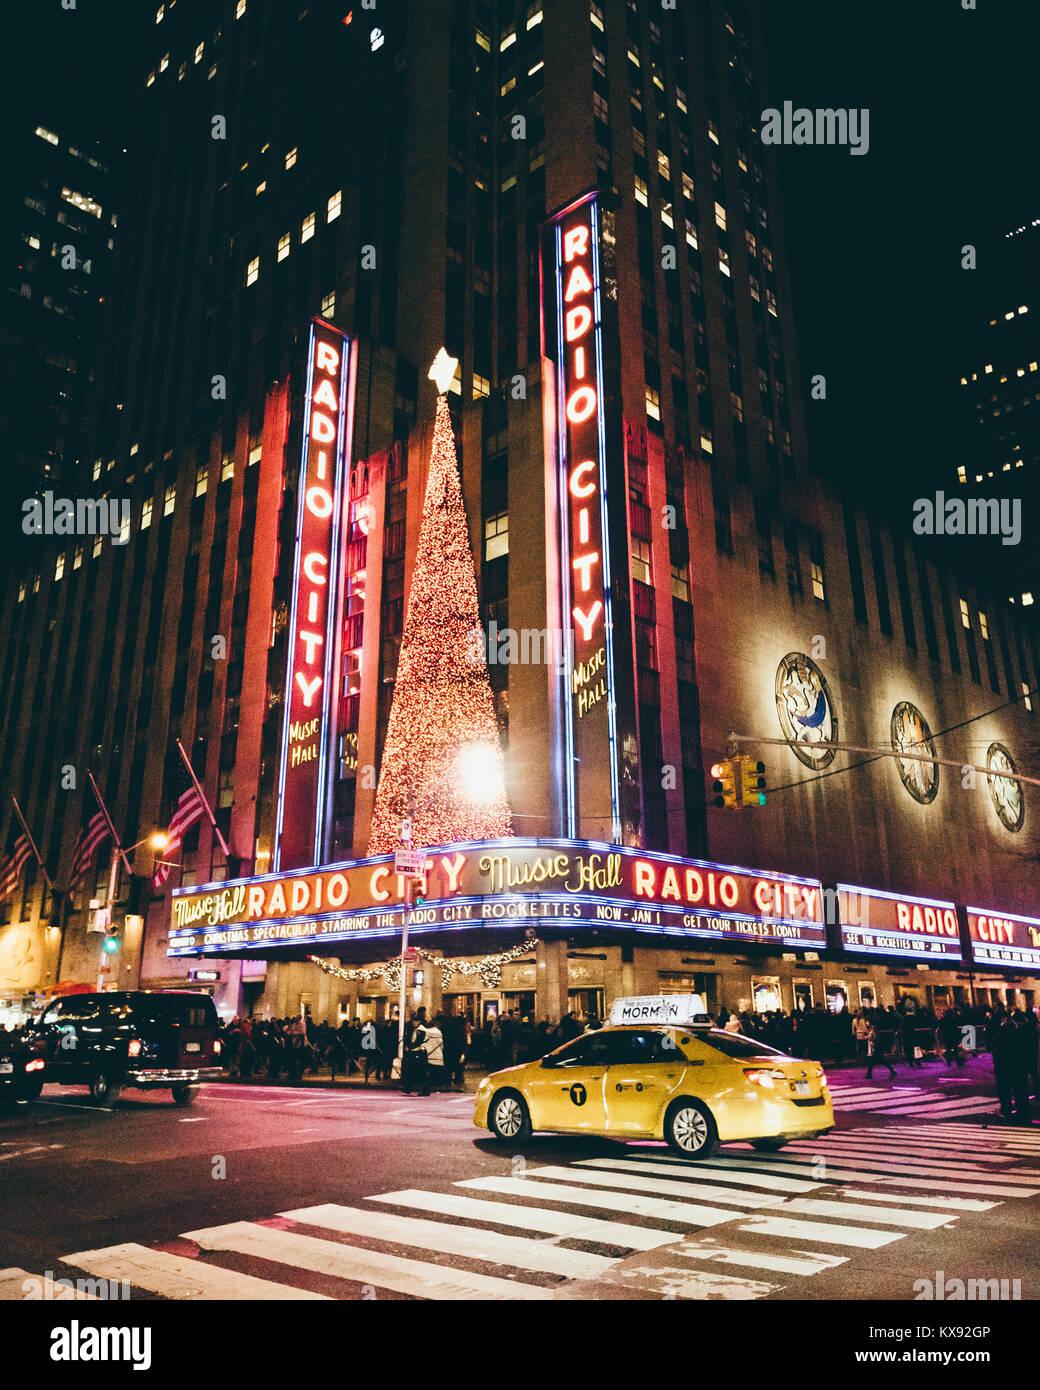 Radio City Music Hall - Stock Image